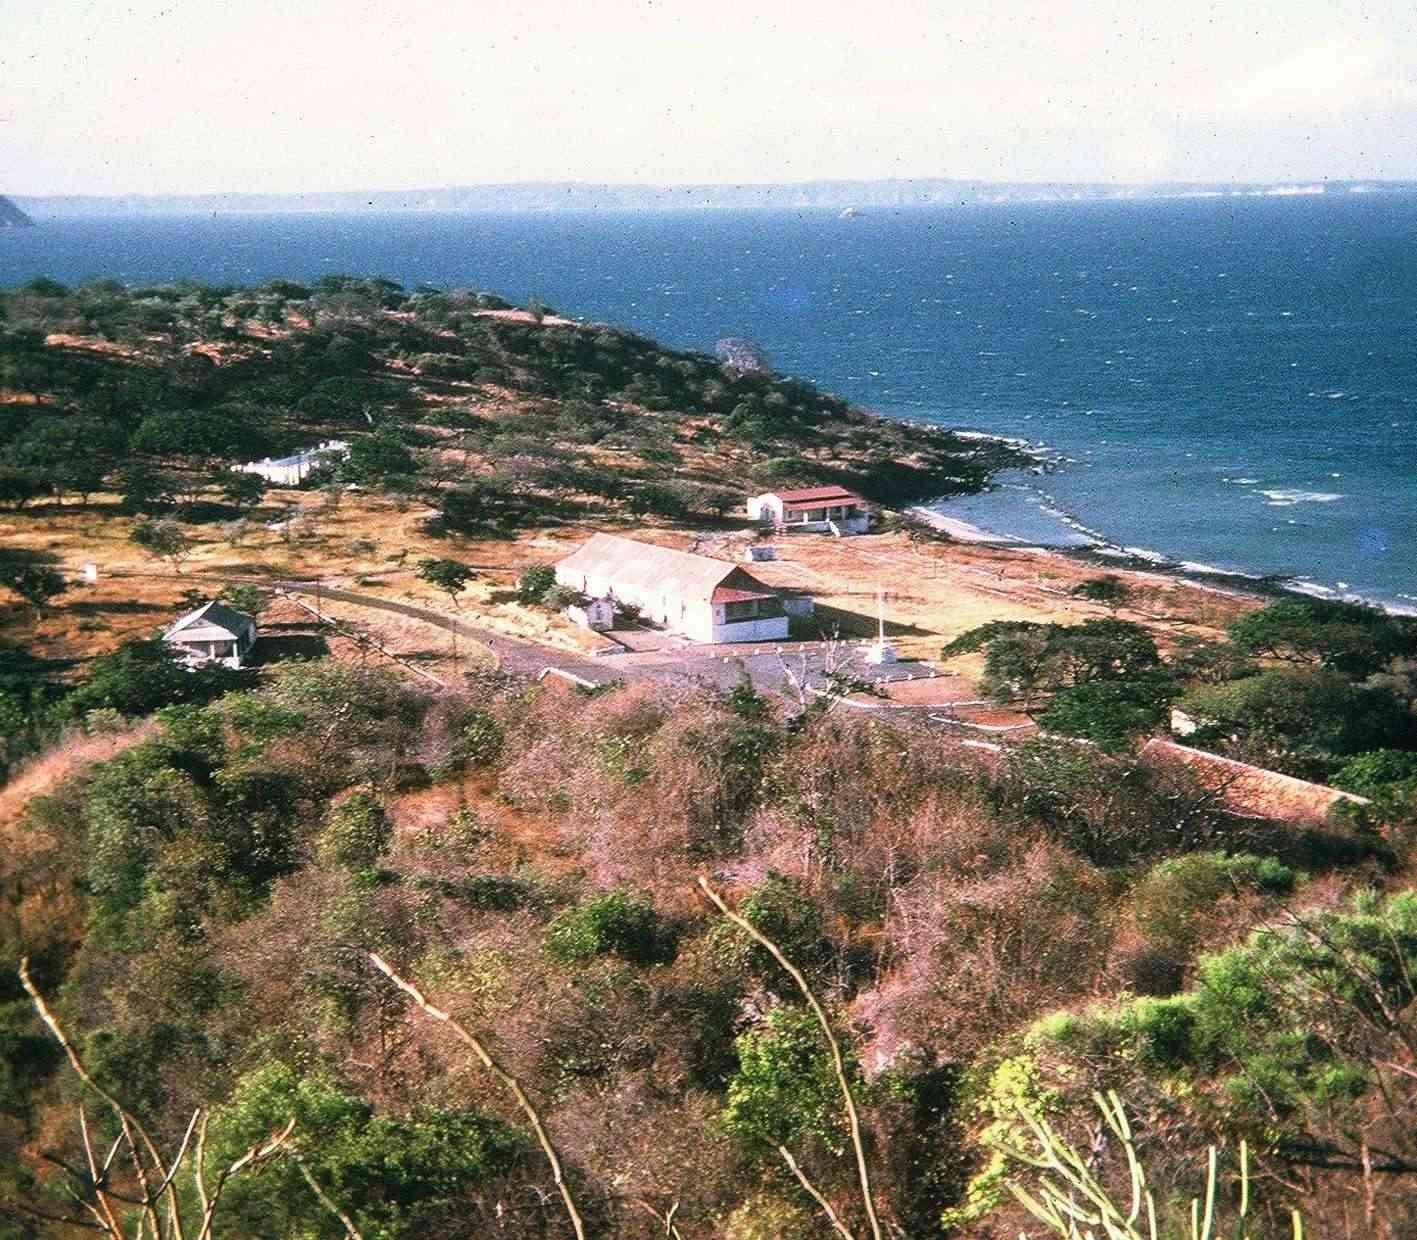 [Divers campagne Madagascar] CAP DIEGO AU CID 1972 - Page 2 Cd1_pa18